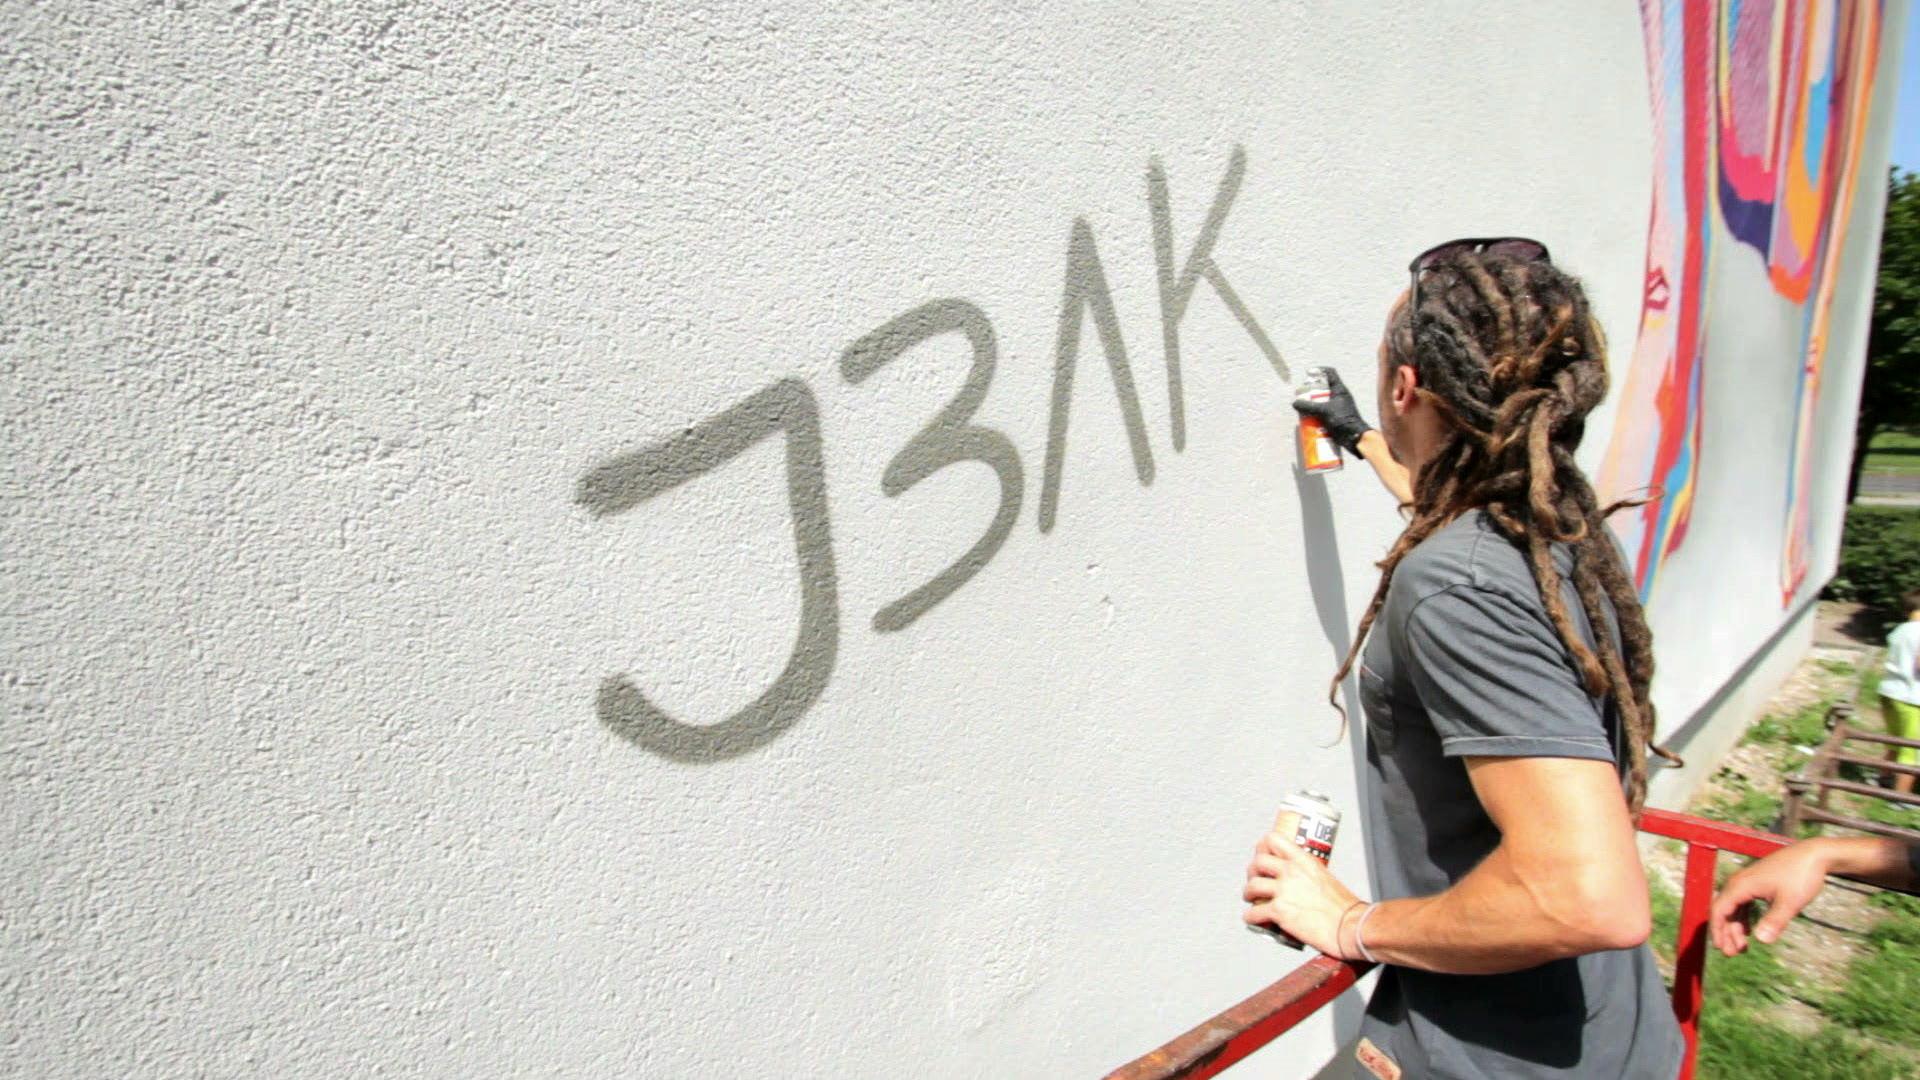 EDITUDE PICTURES JBAK: Totem